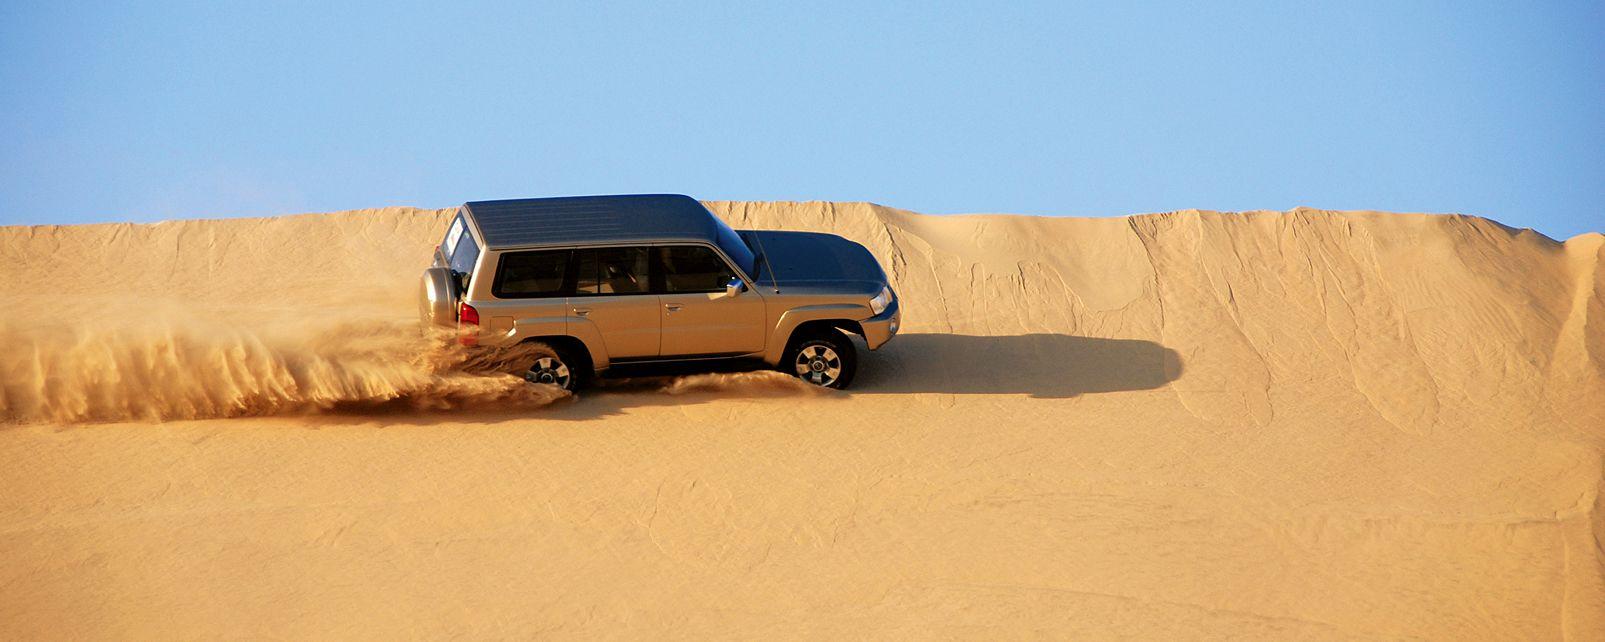 Le Dune Bashing dans le désert qatari , Qatar